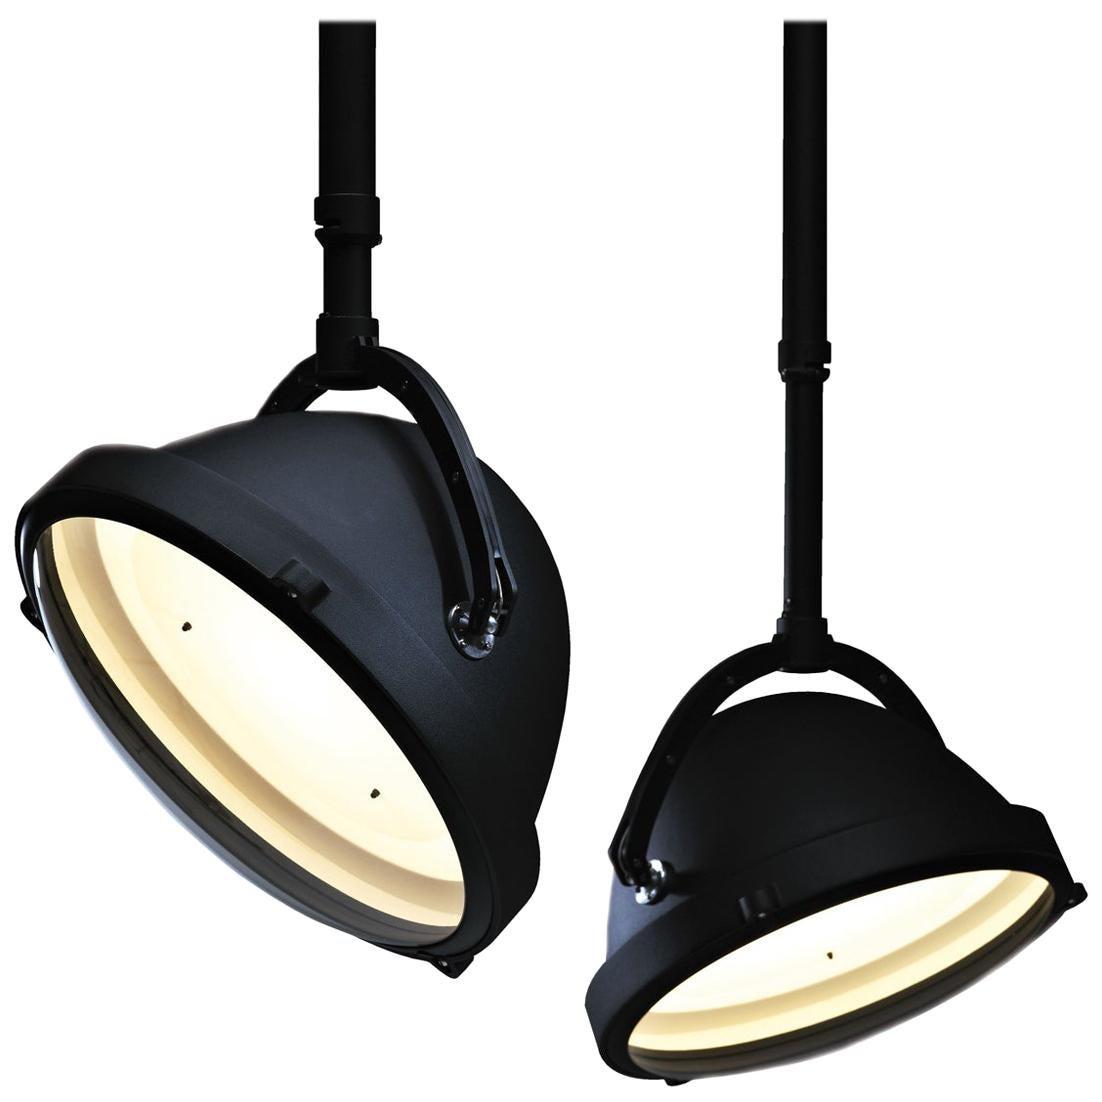 Jacco Maris LED Outsider Adjustable Pendant Light